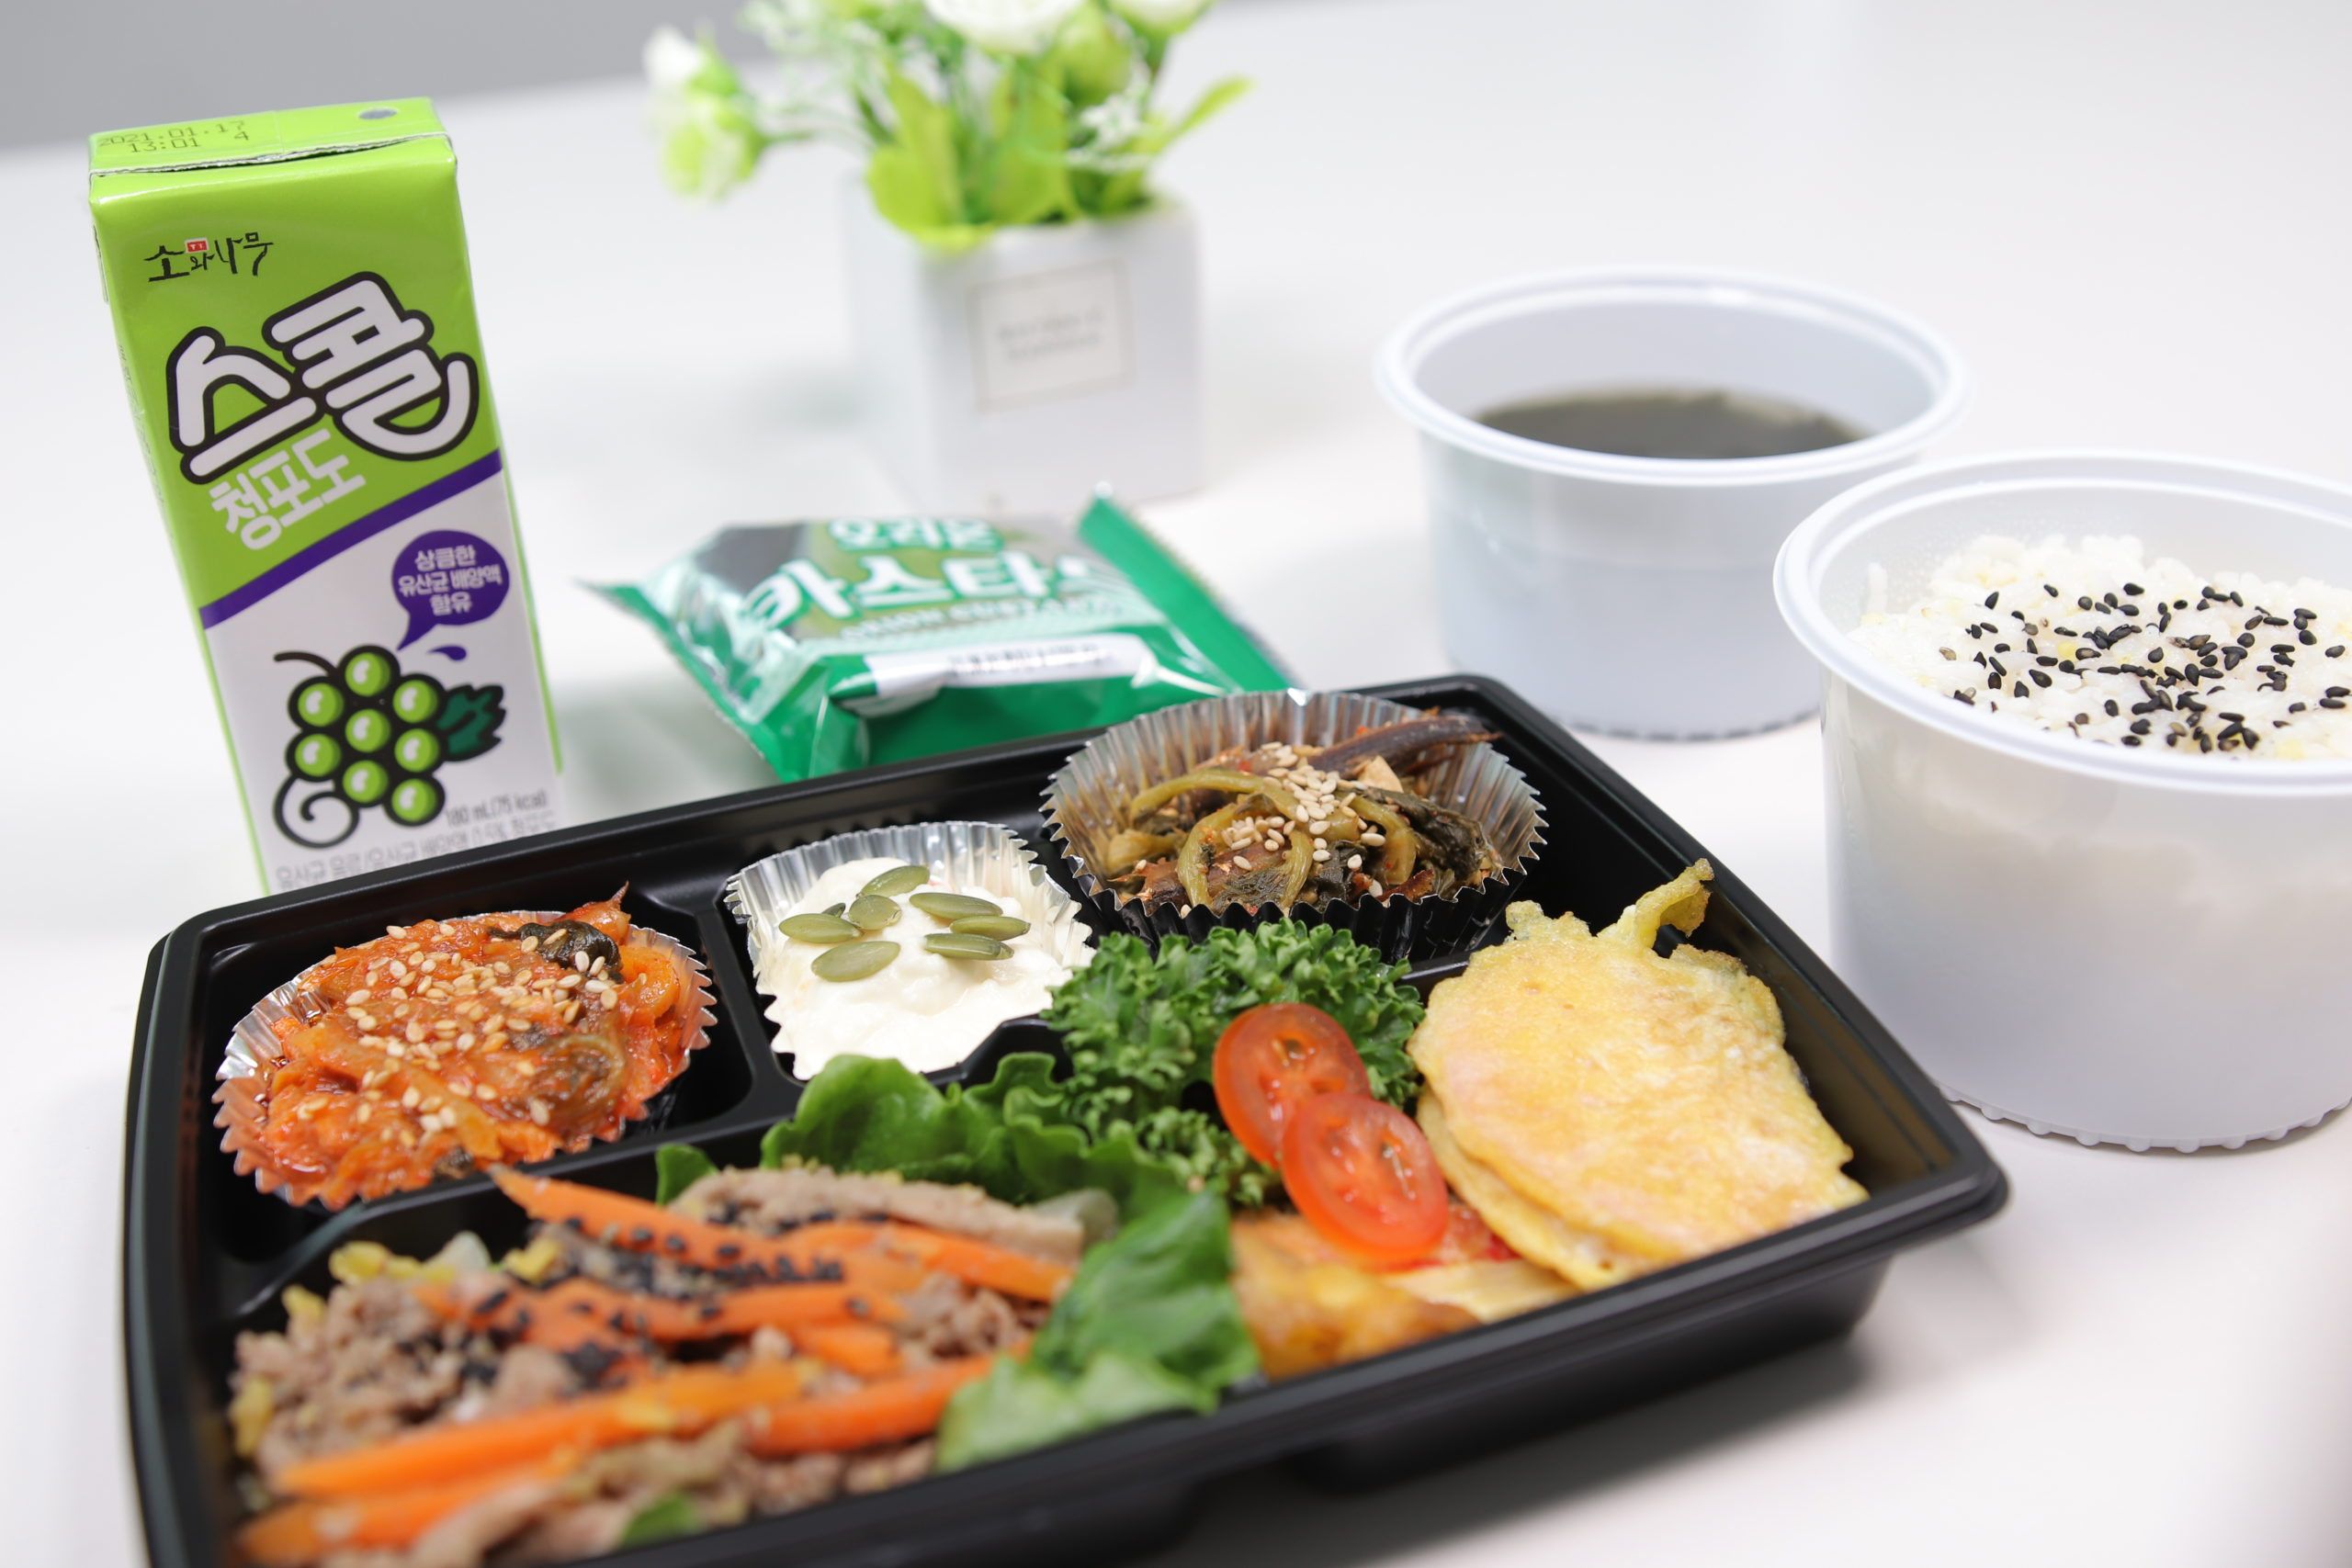 Quarantine meal example